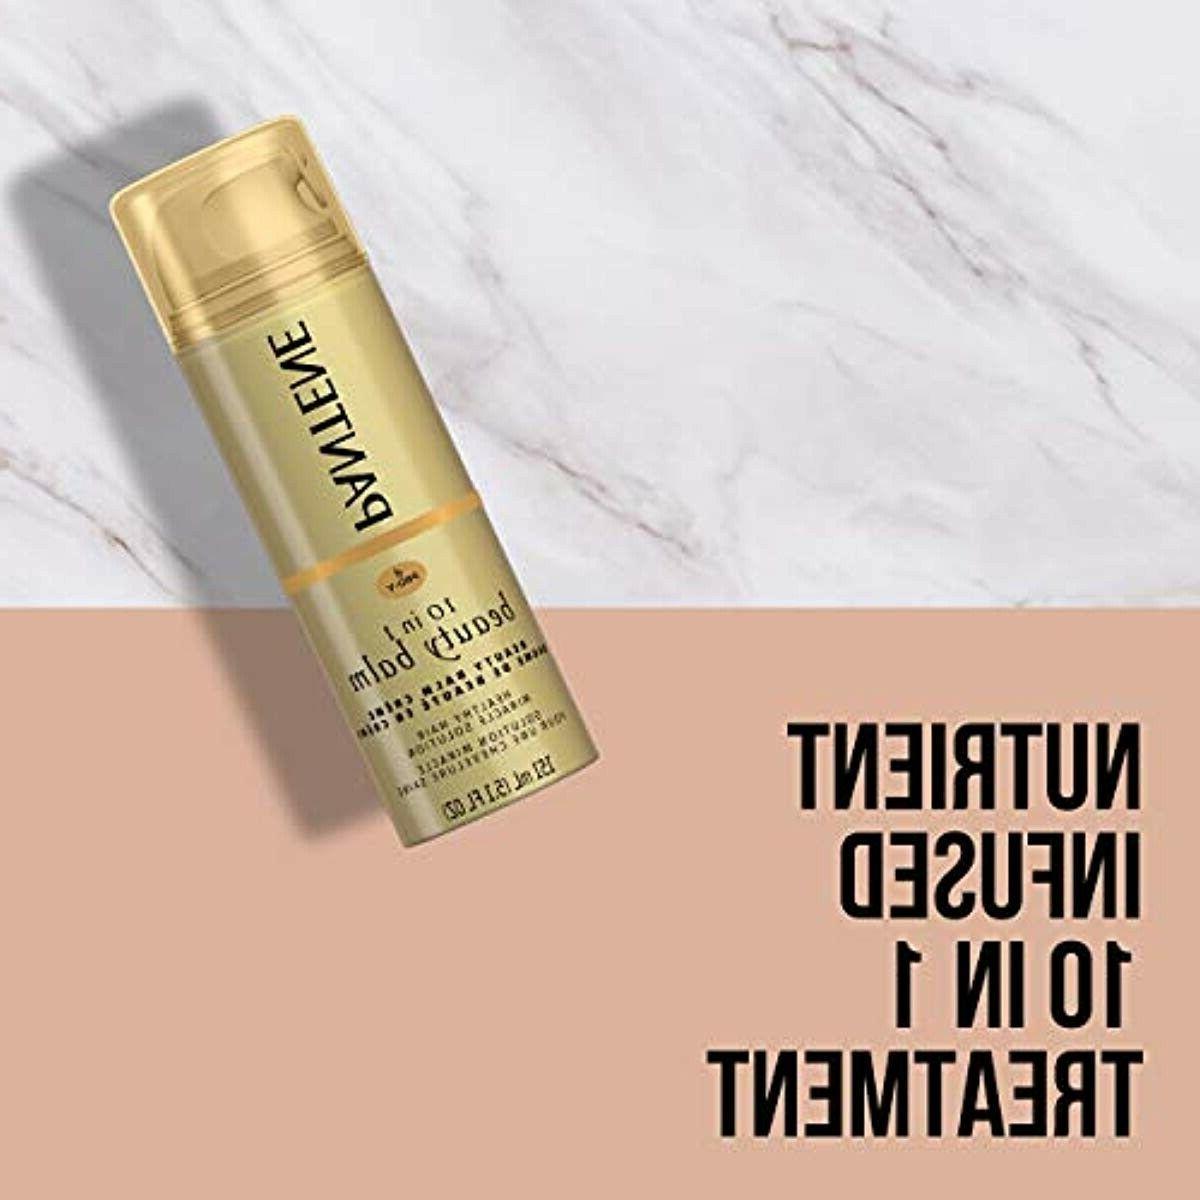 Pantene Ultimate Beauty Balm Crème Hair, 5.1 Fl